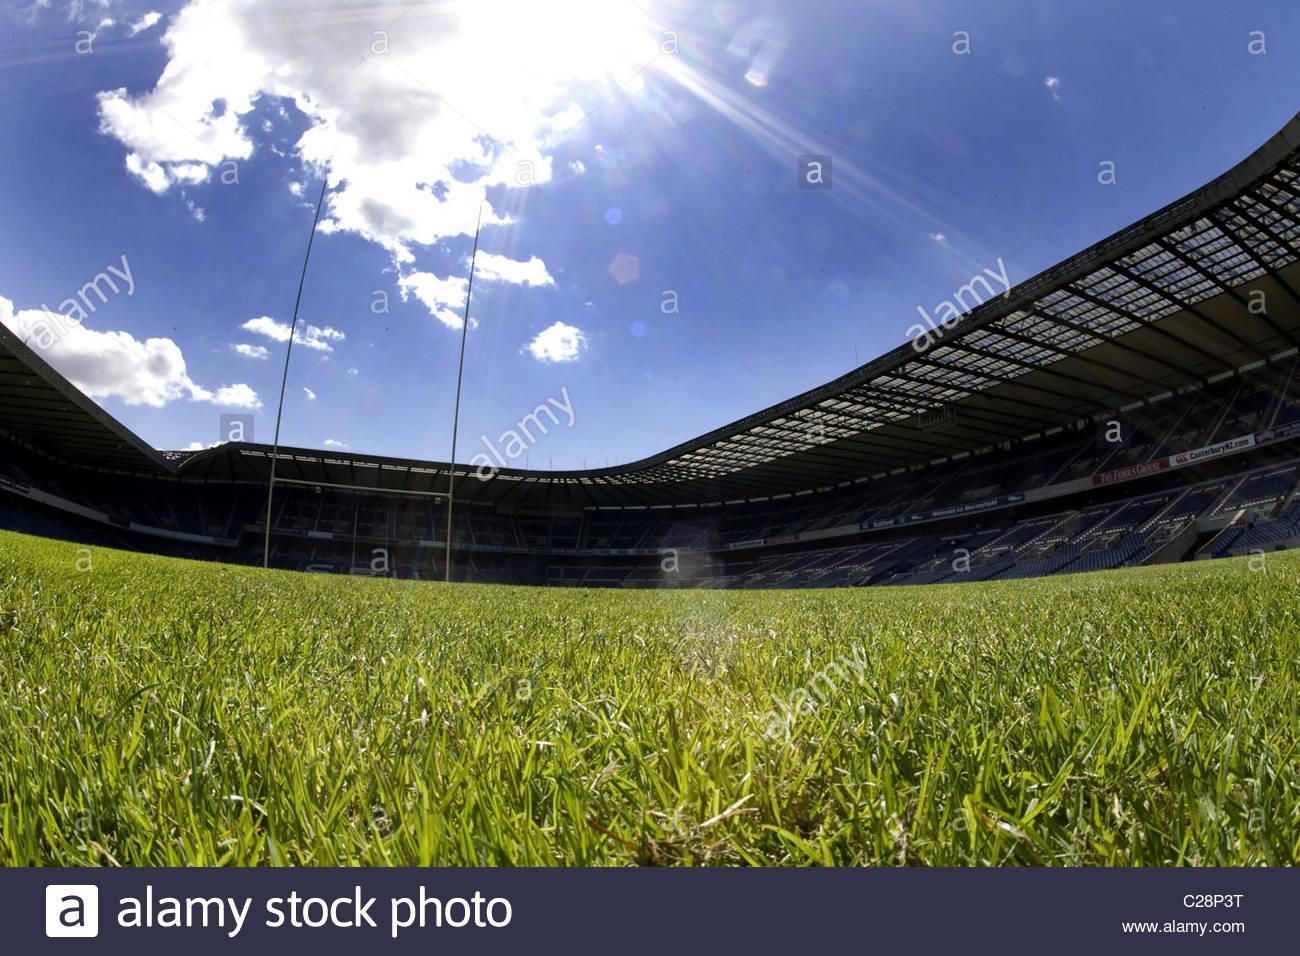 08/08/07  MURRAYFIELD - EDINBURGH  GV of Murrayfield Stadium, home of the Scotland national rugby team. - Stock Image